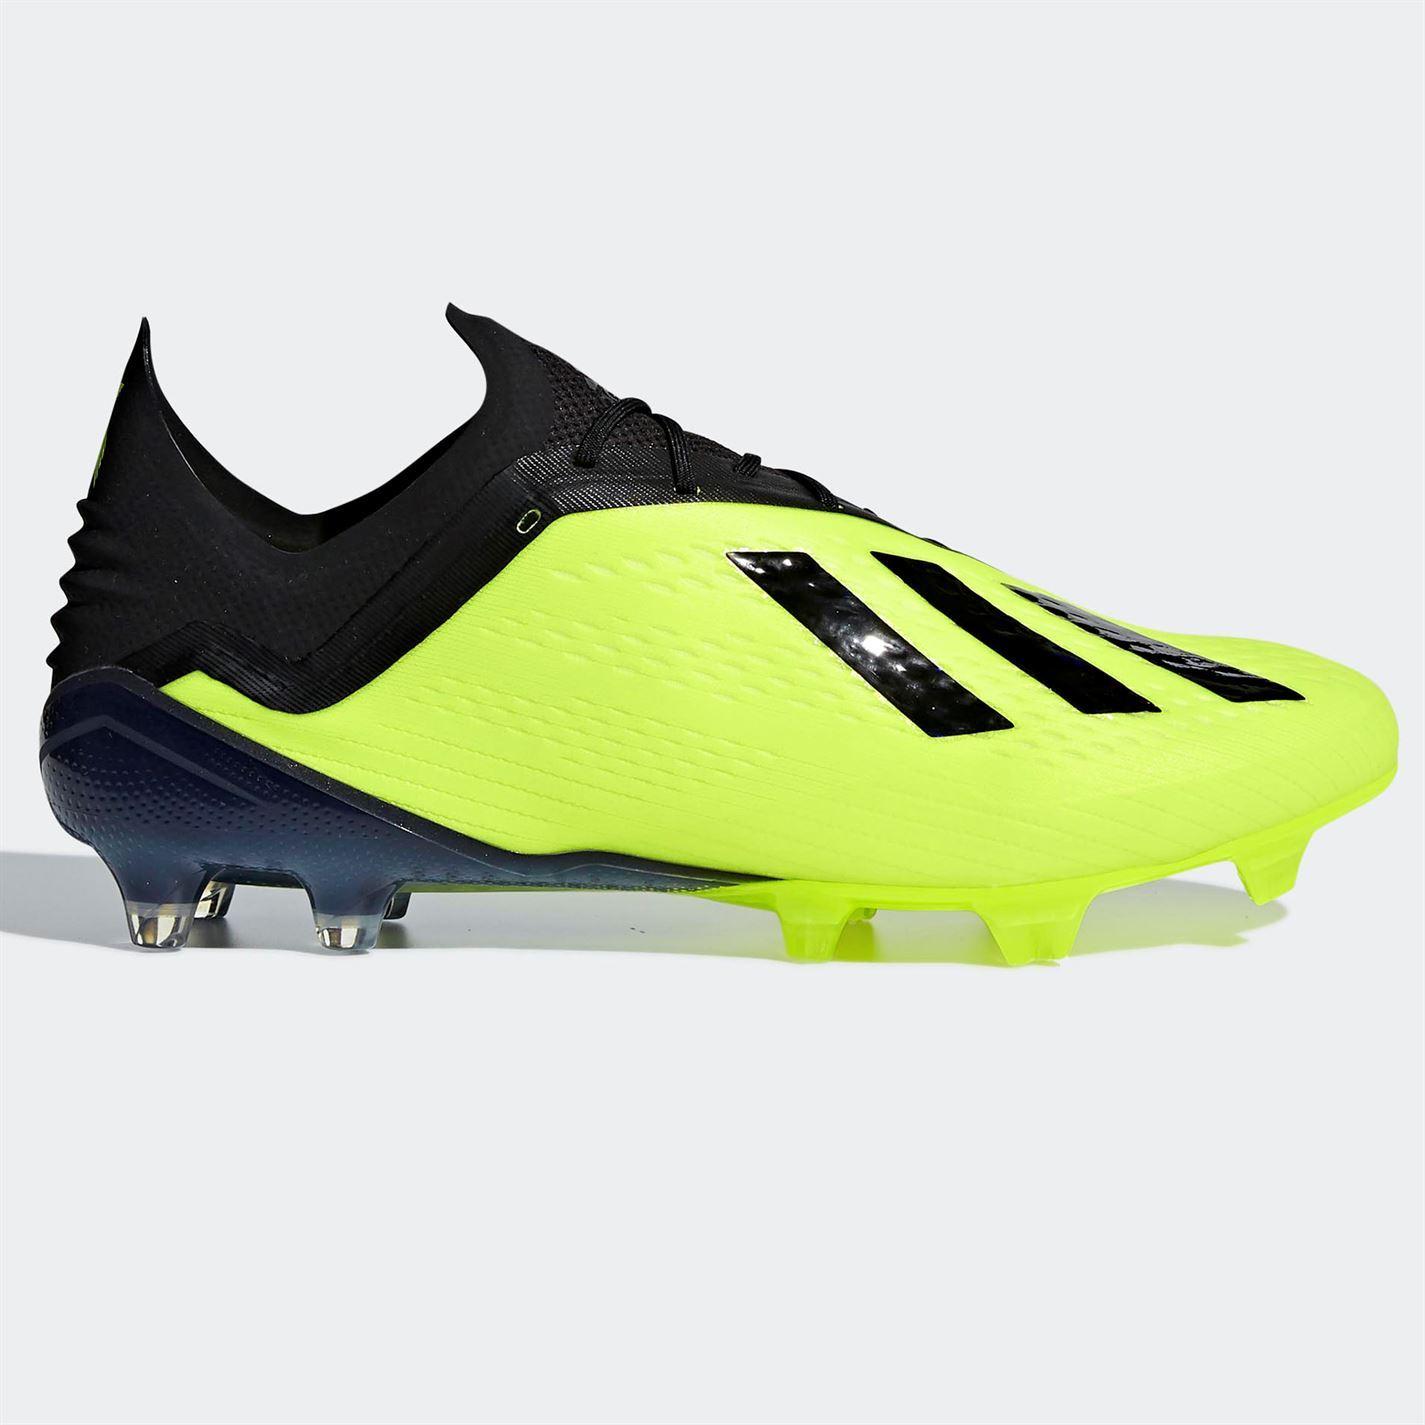 Adidas-x-18-1-FG-Firm-Ground-Chaussures-De-Football-Homme-Football-Chaussures-Crampons miniature 7